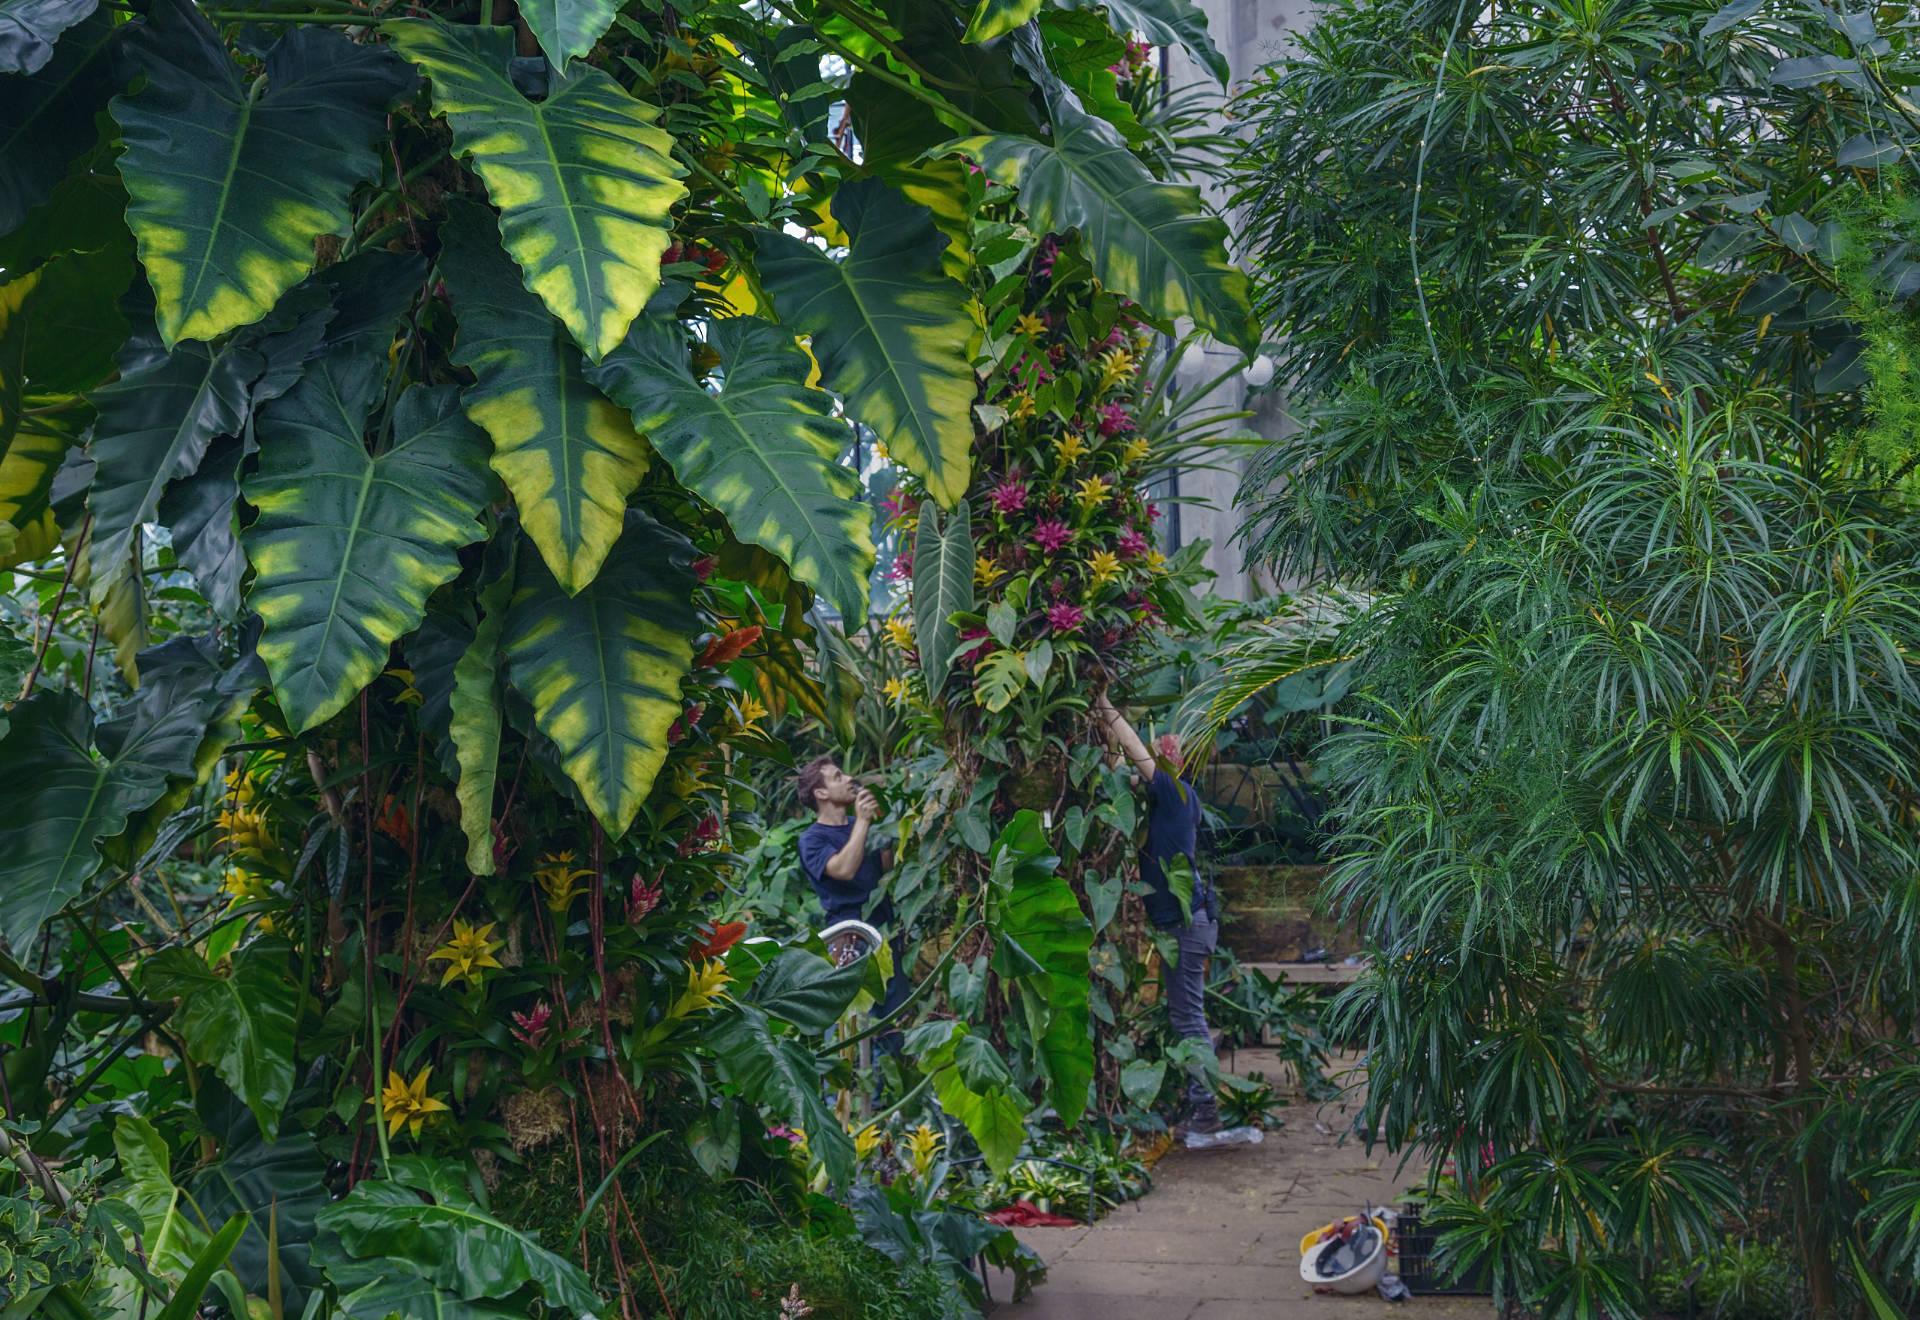 Captured at Kew